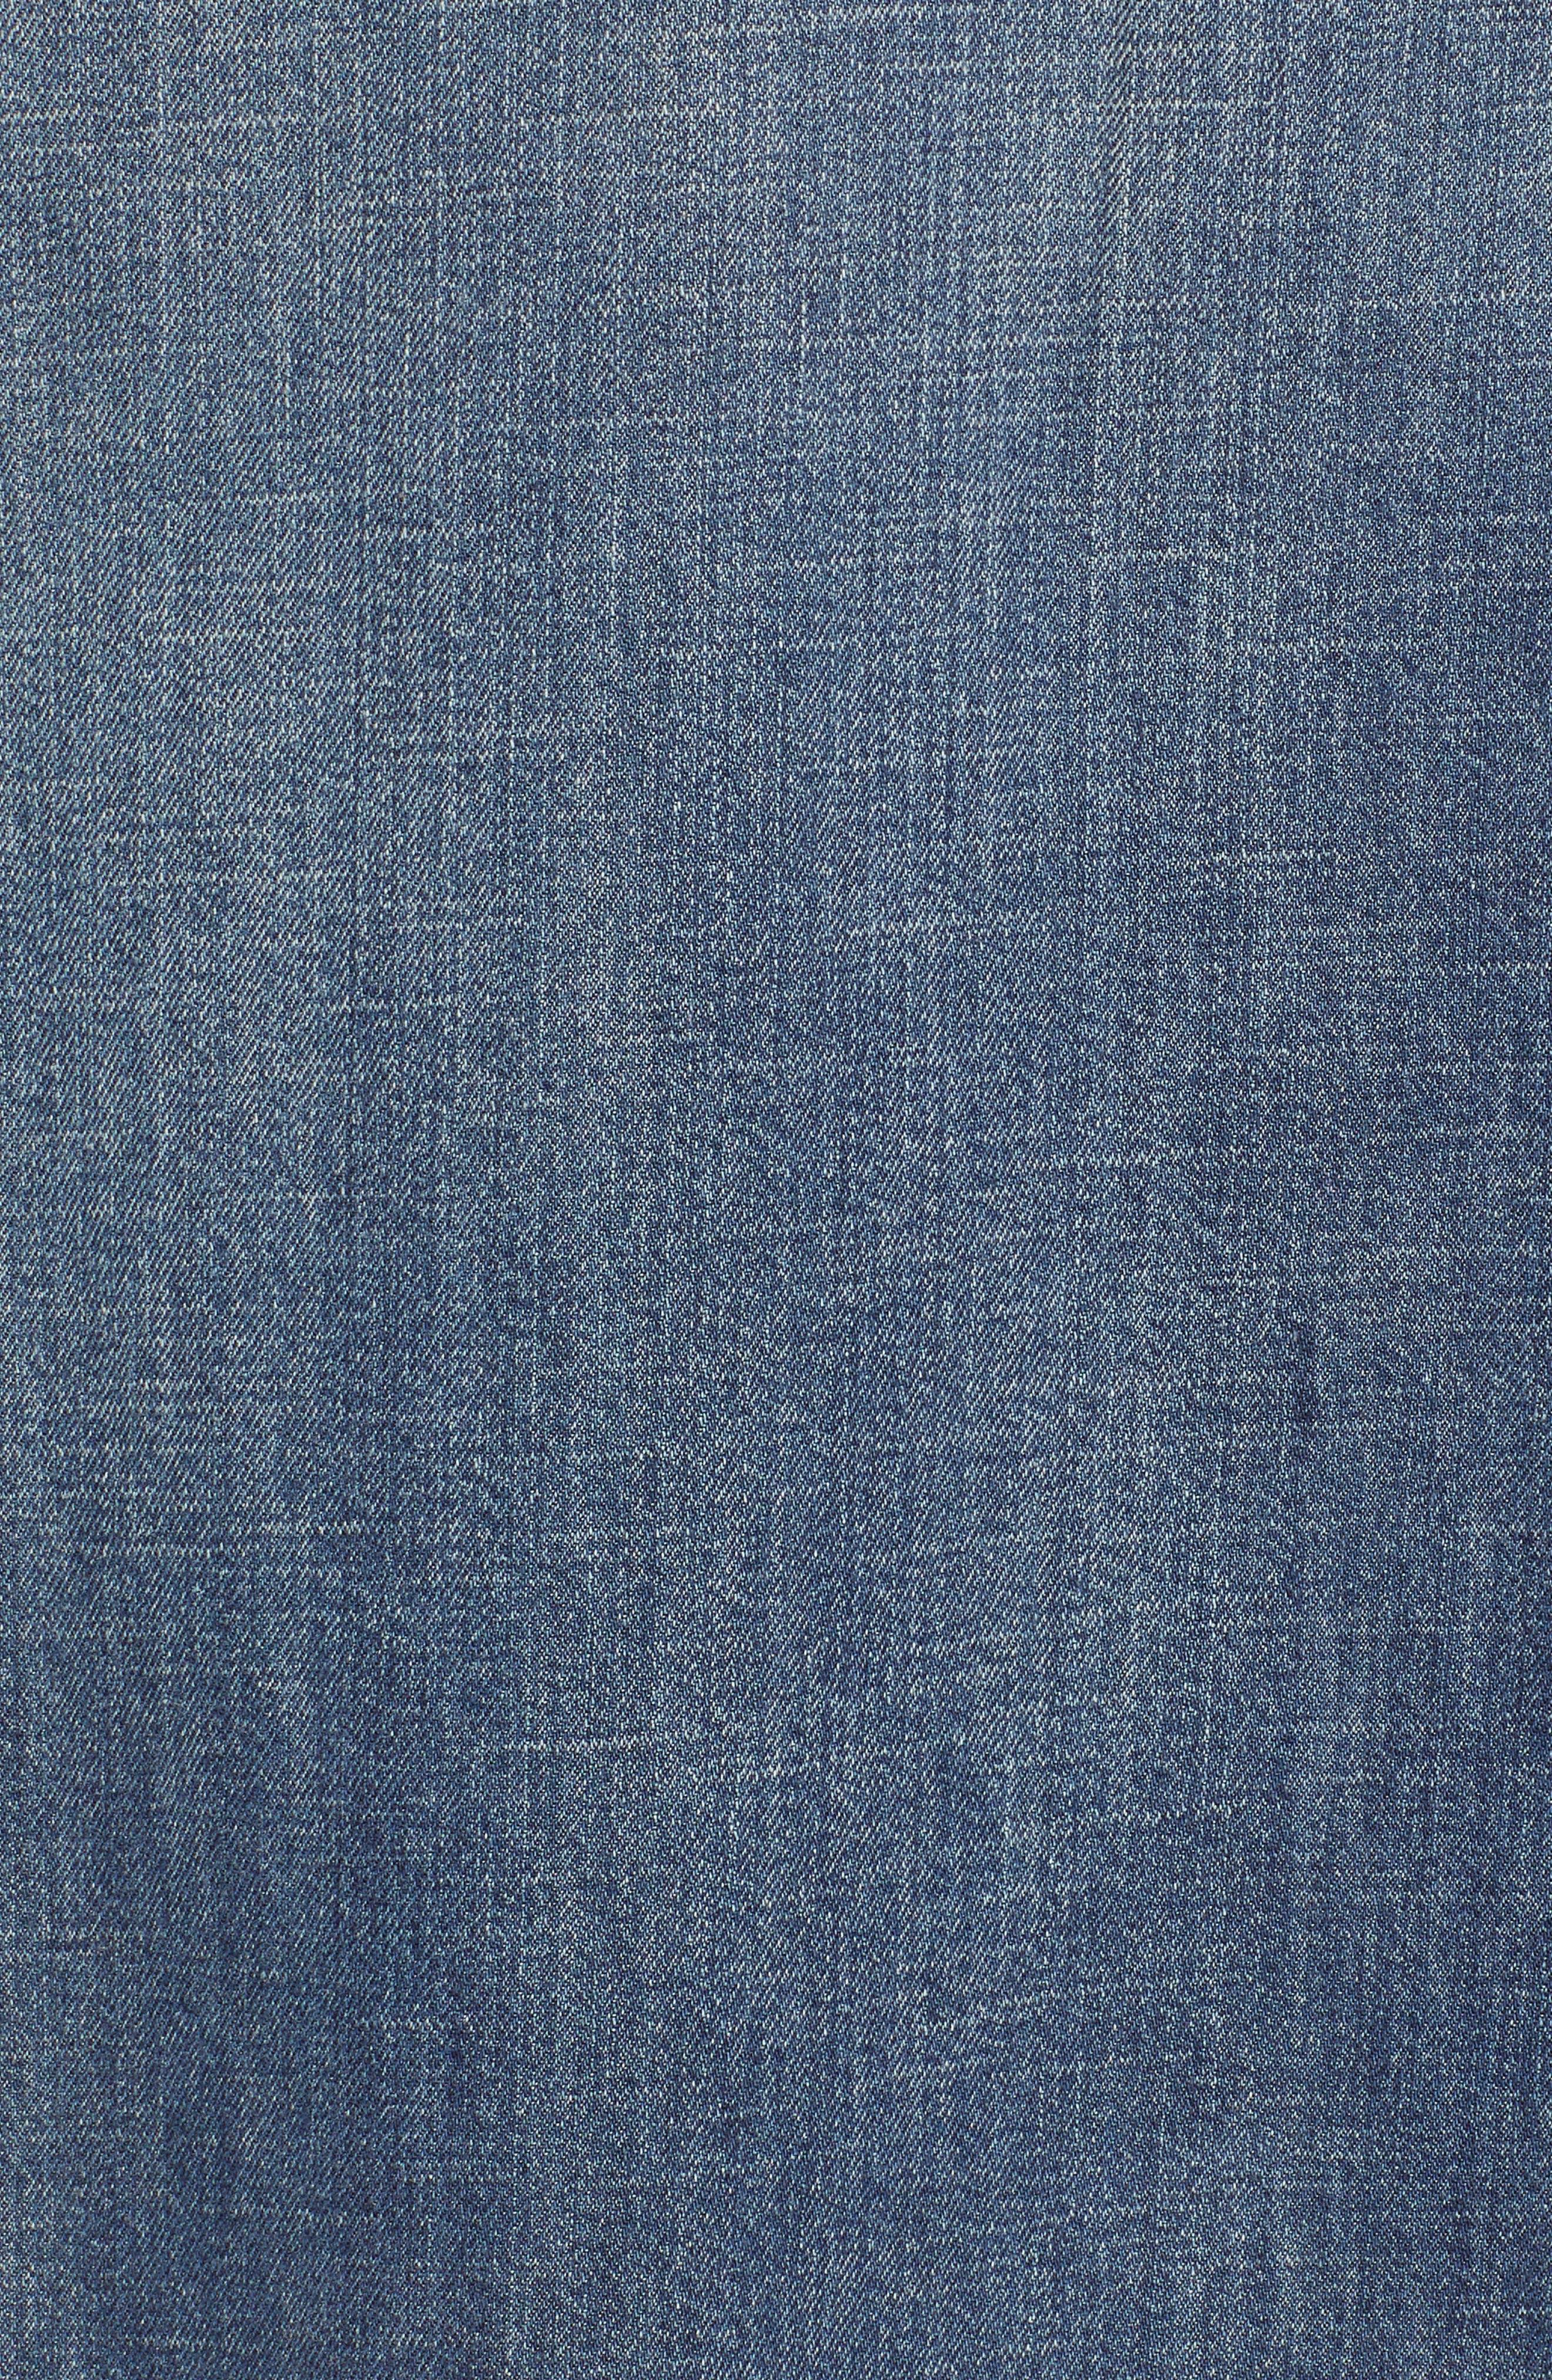 Regular Fit Denim Sport Shirt,                             Alternate thumbnail 5, color,                             420